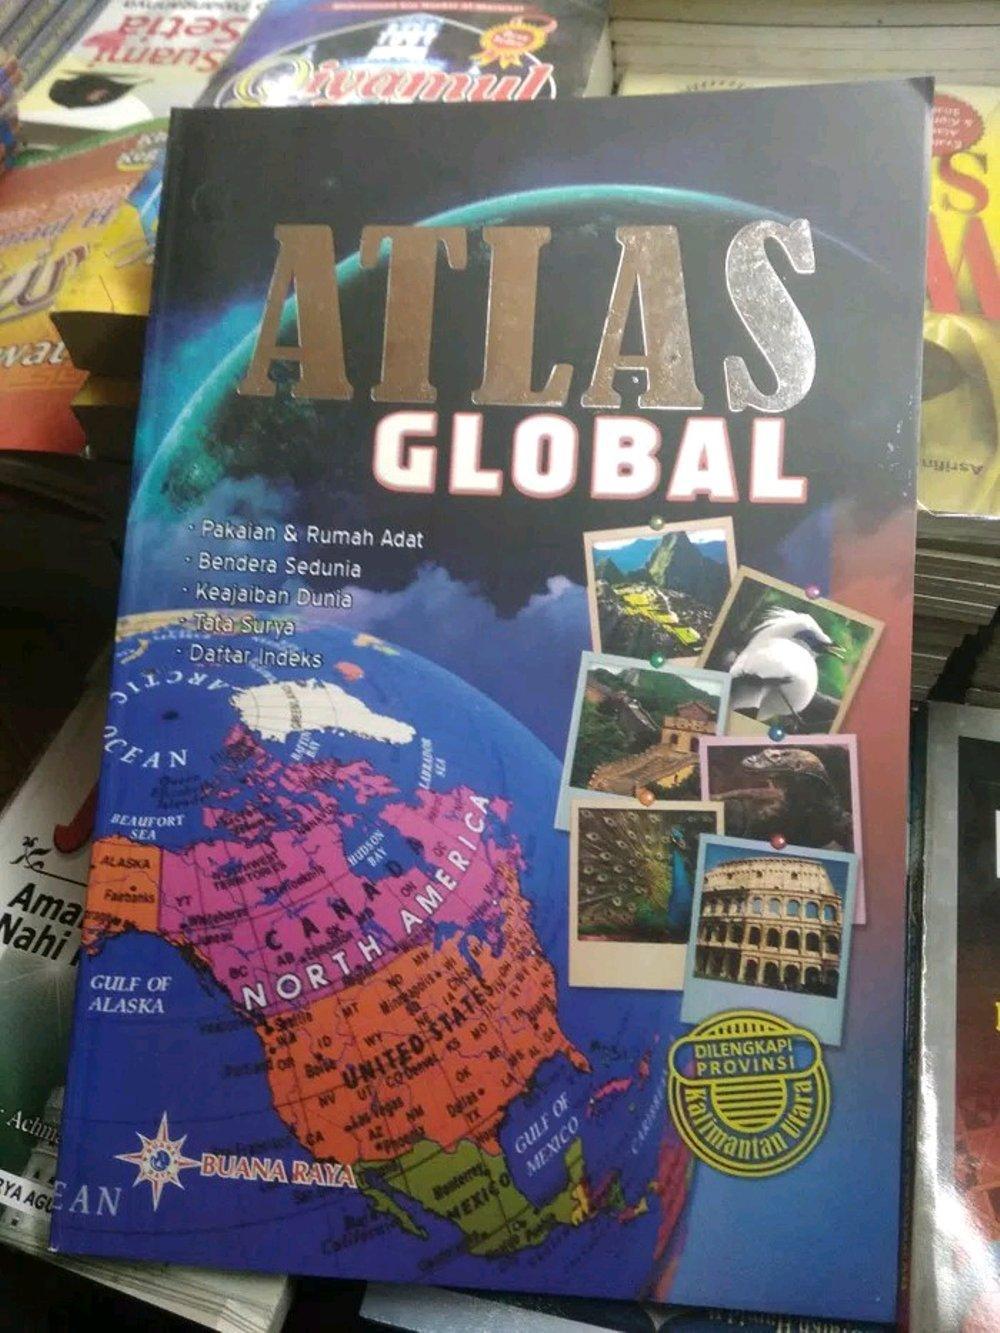 ATLAS GLOBAL dilengkapi provinsi